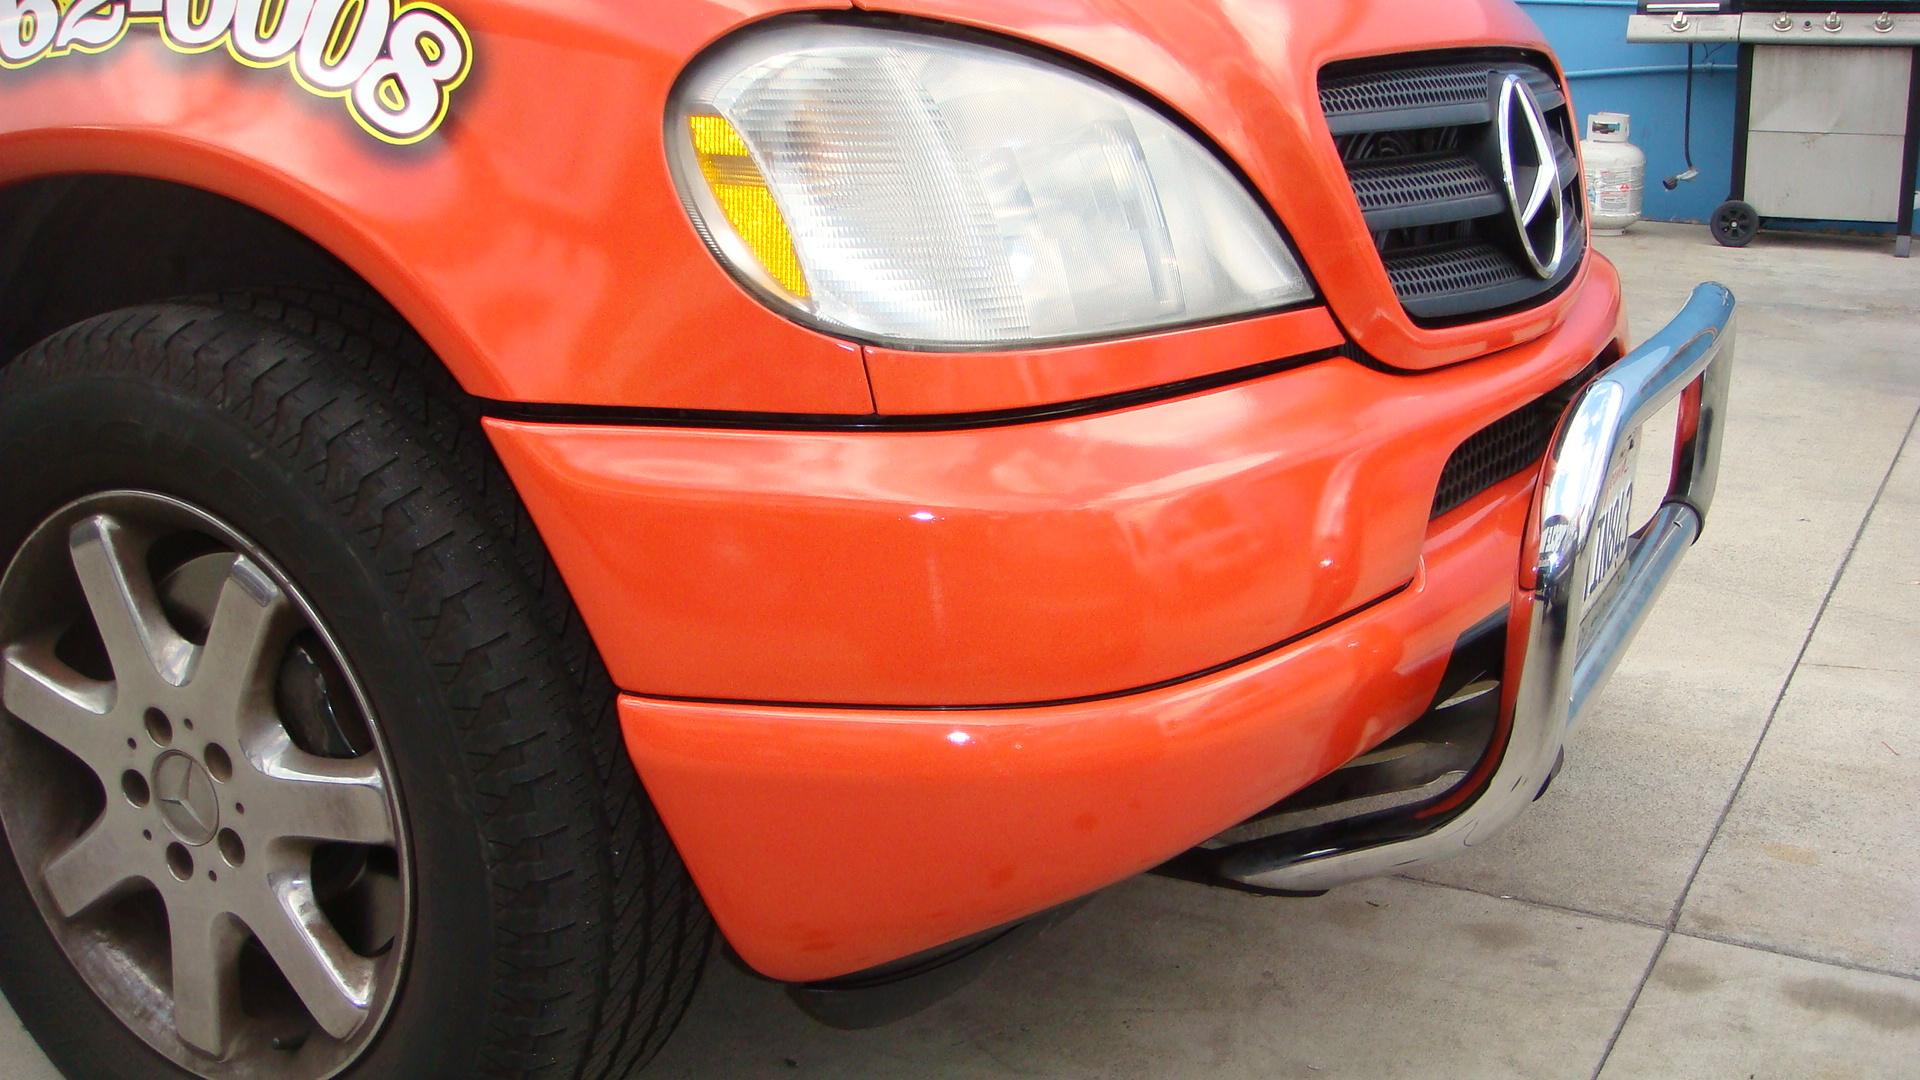 Dickey's Huntington Beach Ca,  Dickey's Vehicle Wraps, Vehicle Wraps Dallas TX